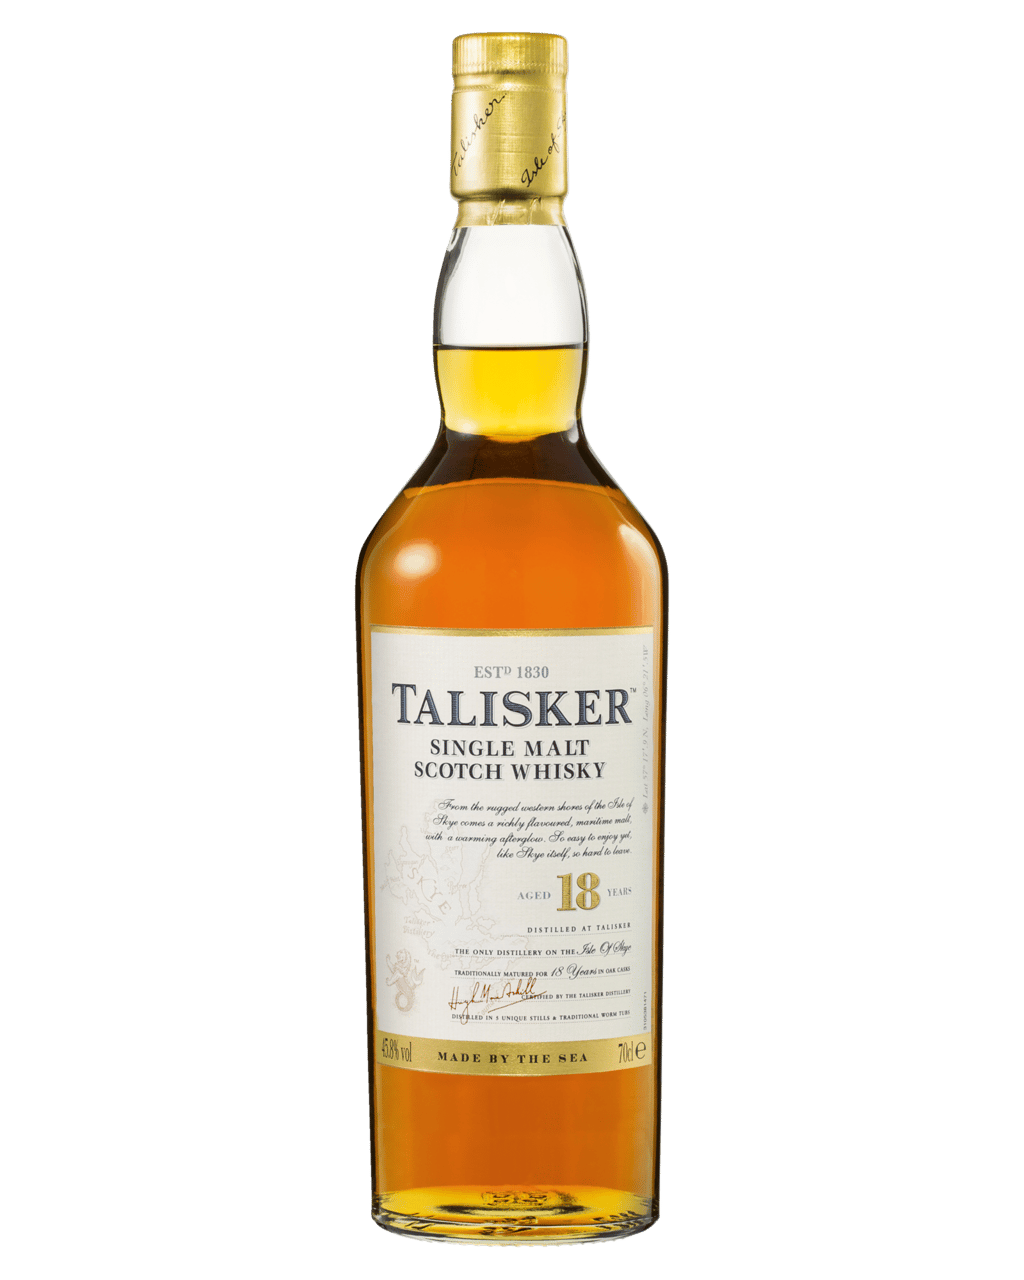 e074e289aff Talisker 18 Year Old Scotch Whisky 700mL